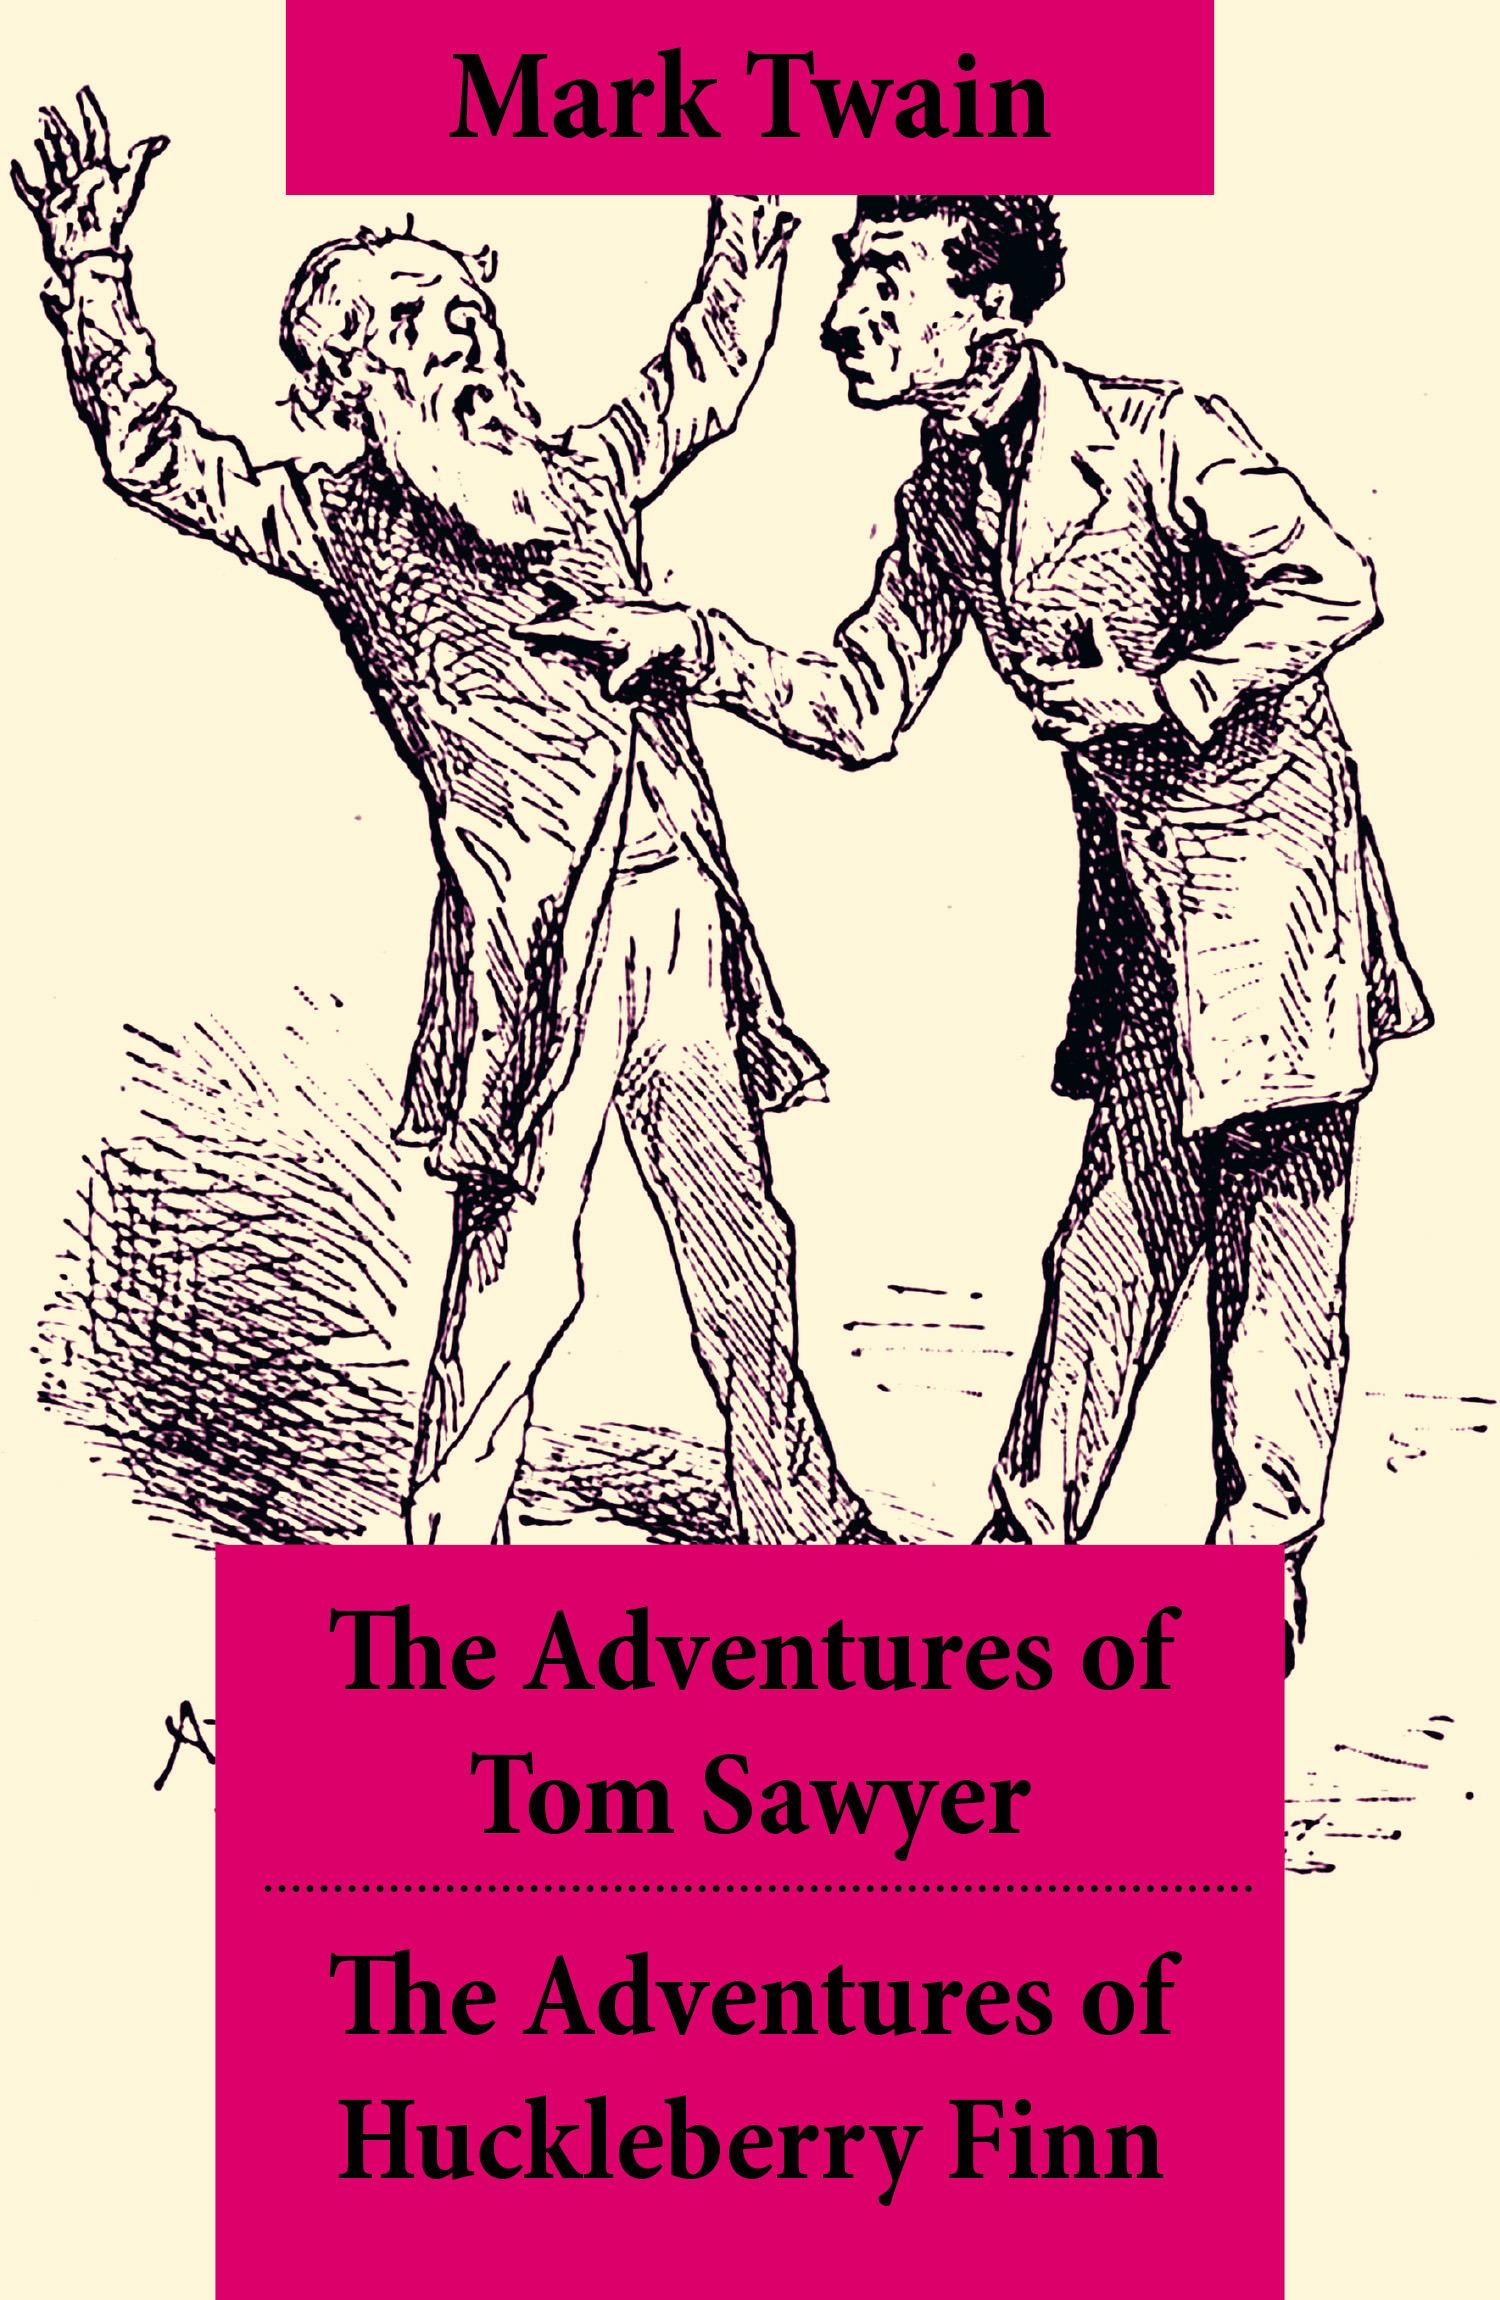 The Adventures of Tom Sawyer + The Adventures of Huckleberry Finn